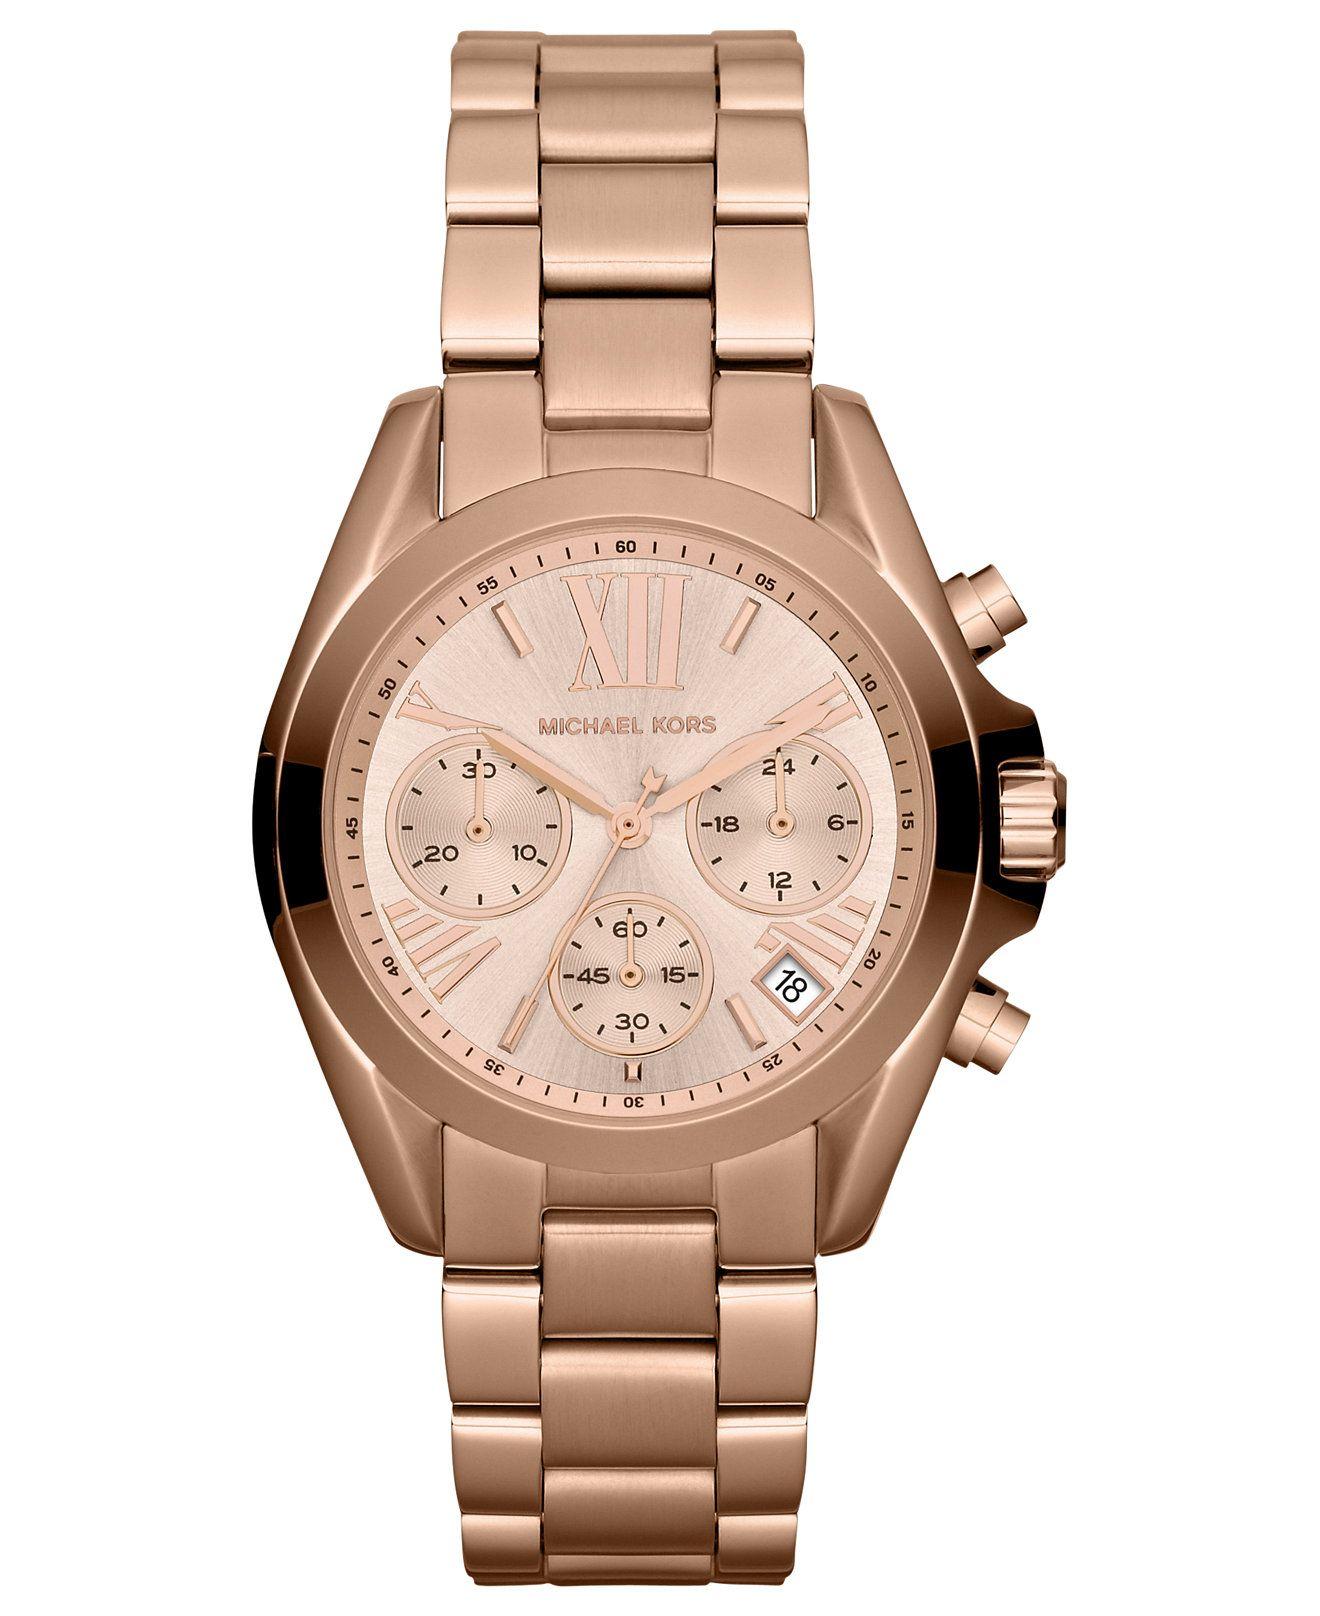 3dee93edf542 Michael Kors Women s Chronograph Mini Bradshaw Rose Gold-Tone Stainless  Steel Bracelet Watch 35mm MK5799 - Watches - Jewelry   Watches - Macy s